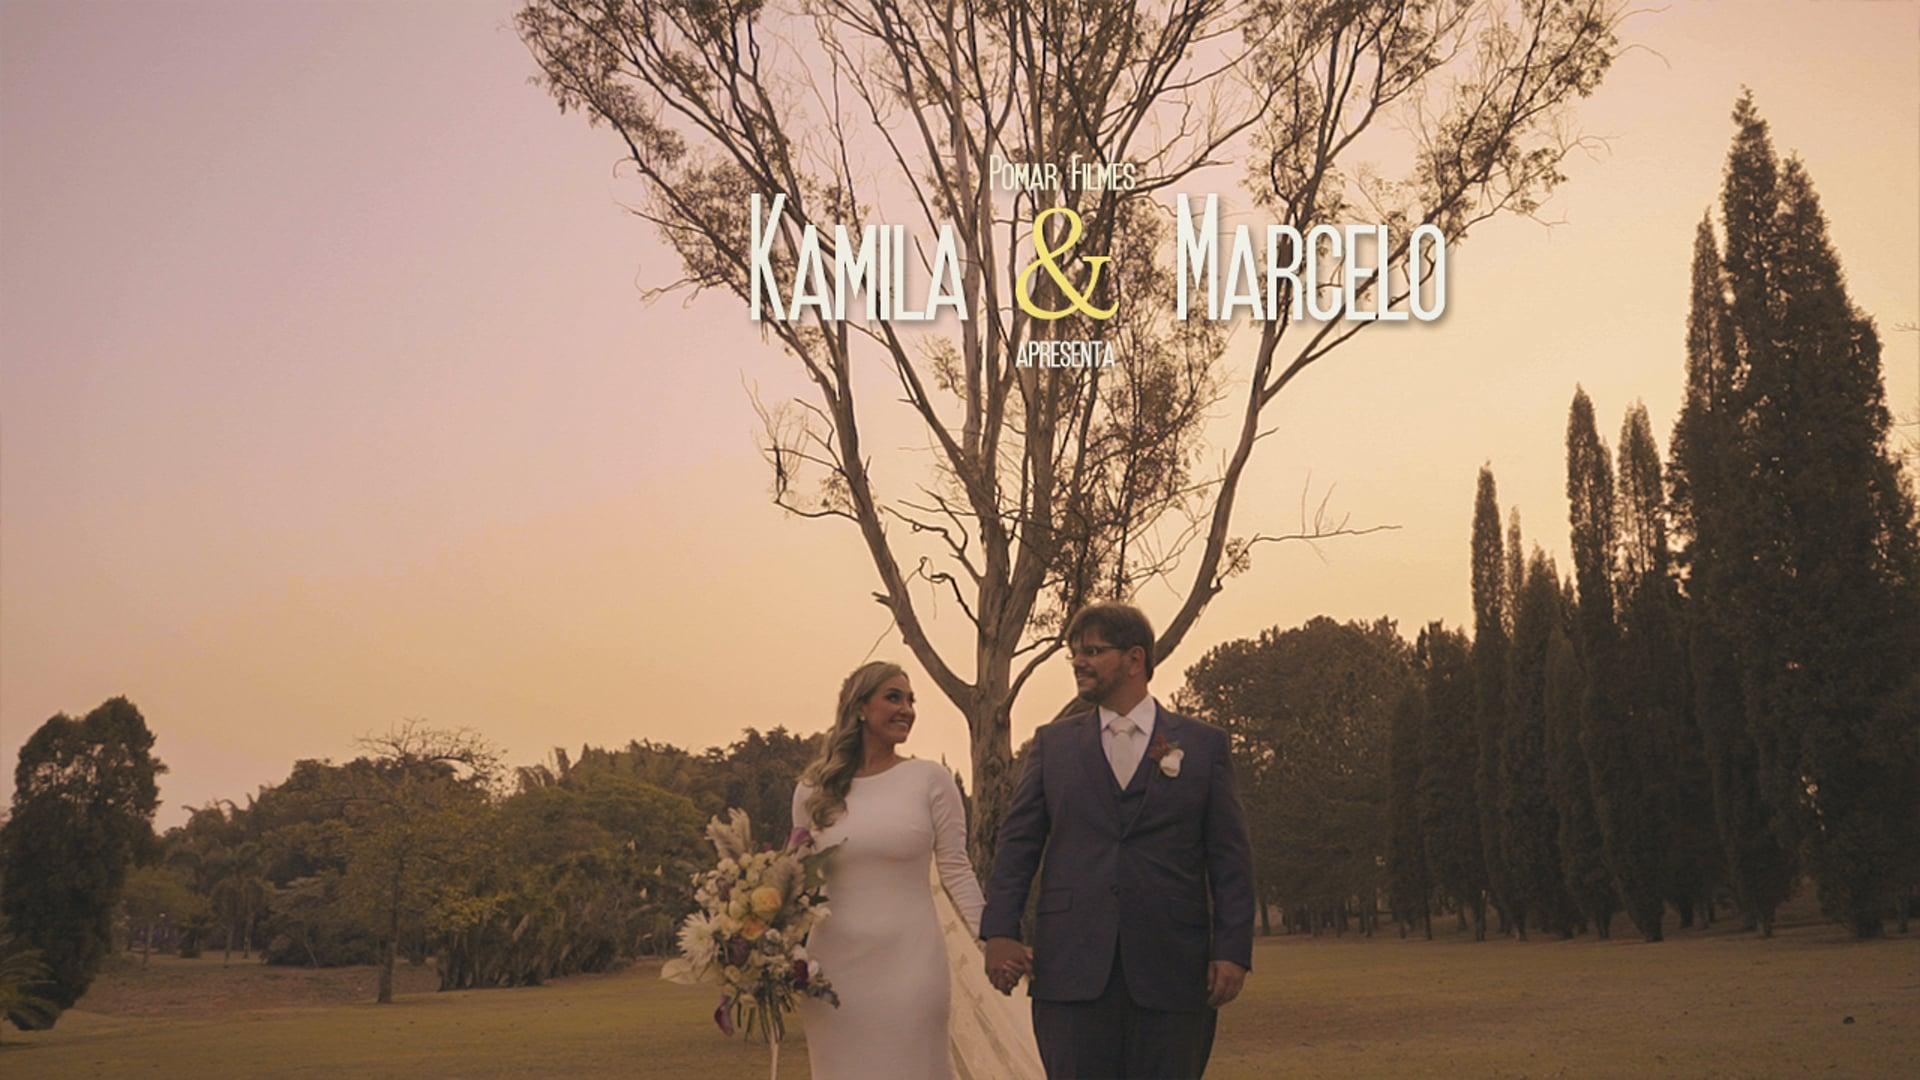 KAMILA E MARCELO